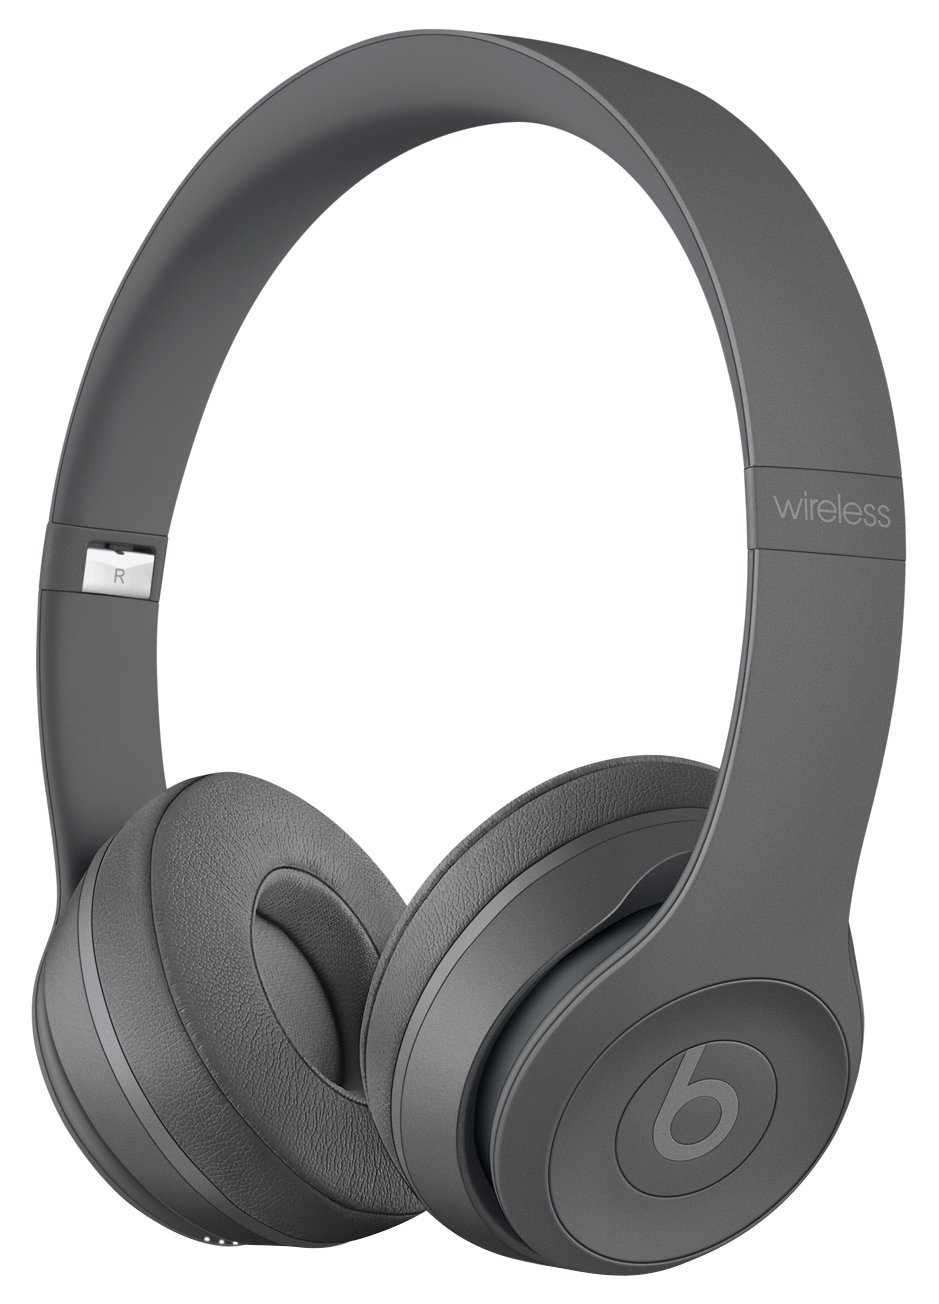 Beats Solo3 best bluetooth wireless headphones for iPhone.jpg